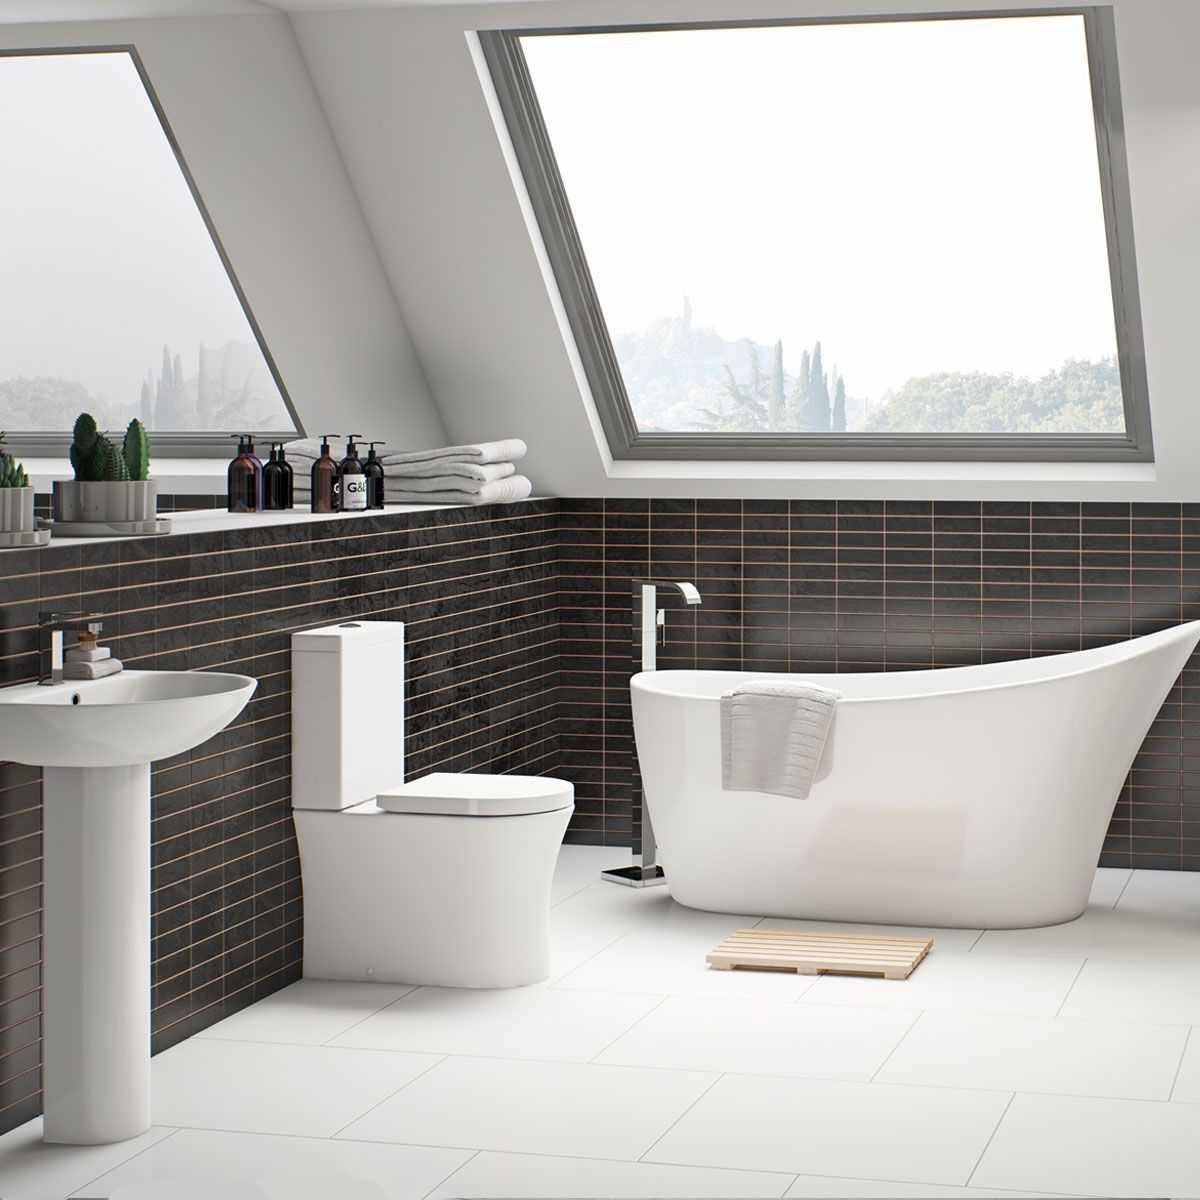 Hardys Fliesen mode hardy rimless bathroom suite with freestanding bath